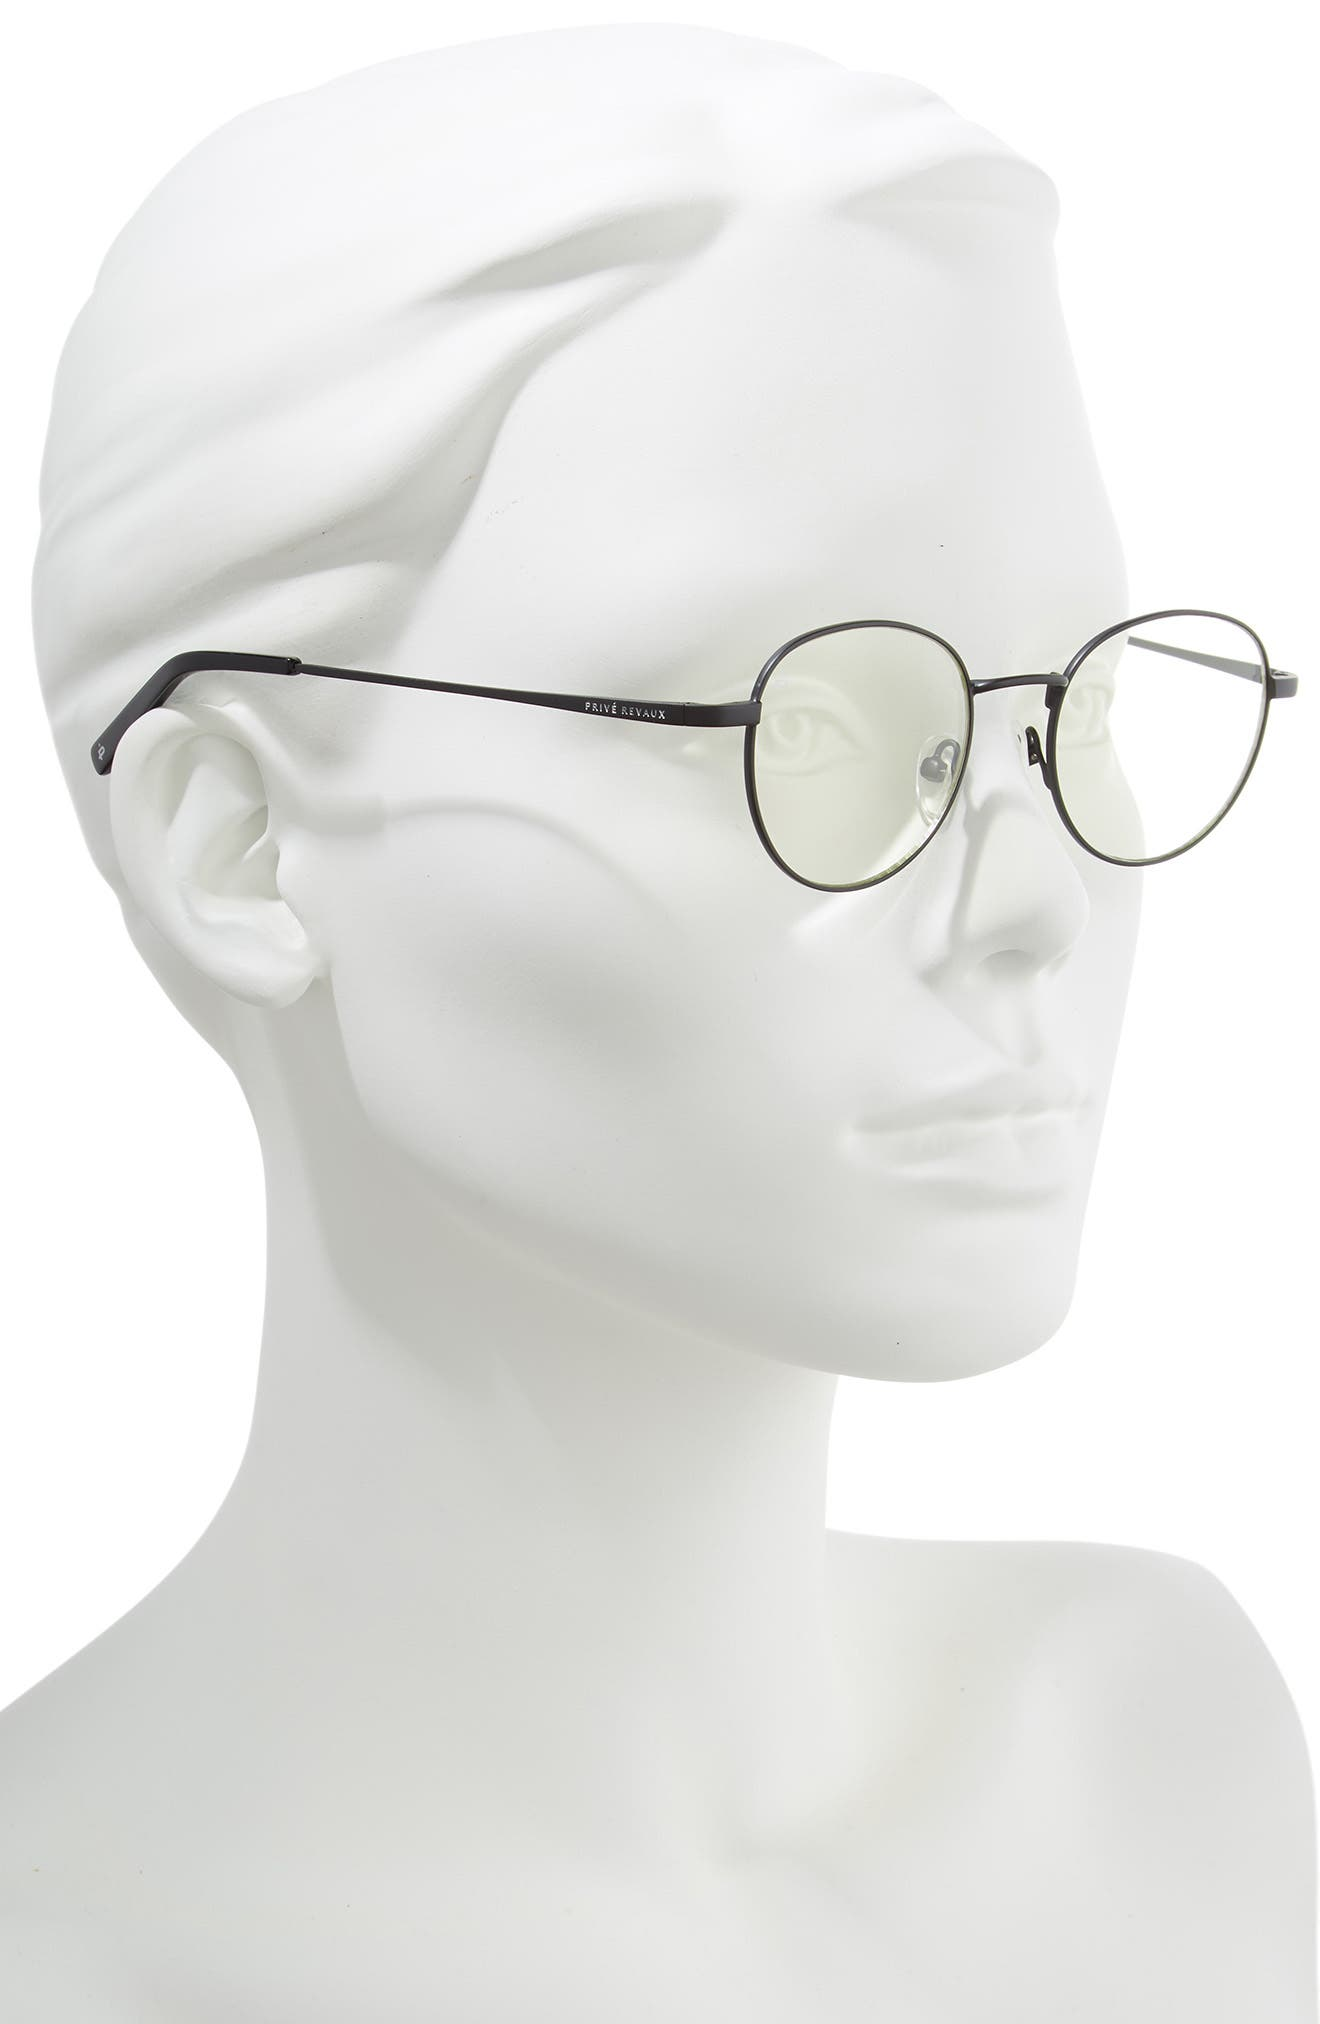 Privé Revaux The Machiavelli 45mm Blue Light Blocking Glasses,                             Alternate thumbnail 2, color,                             001